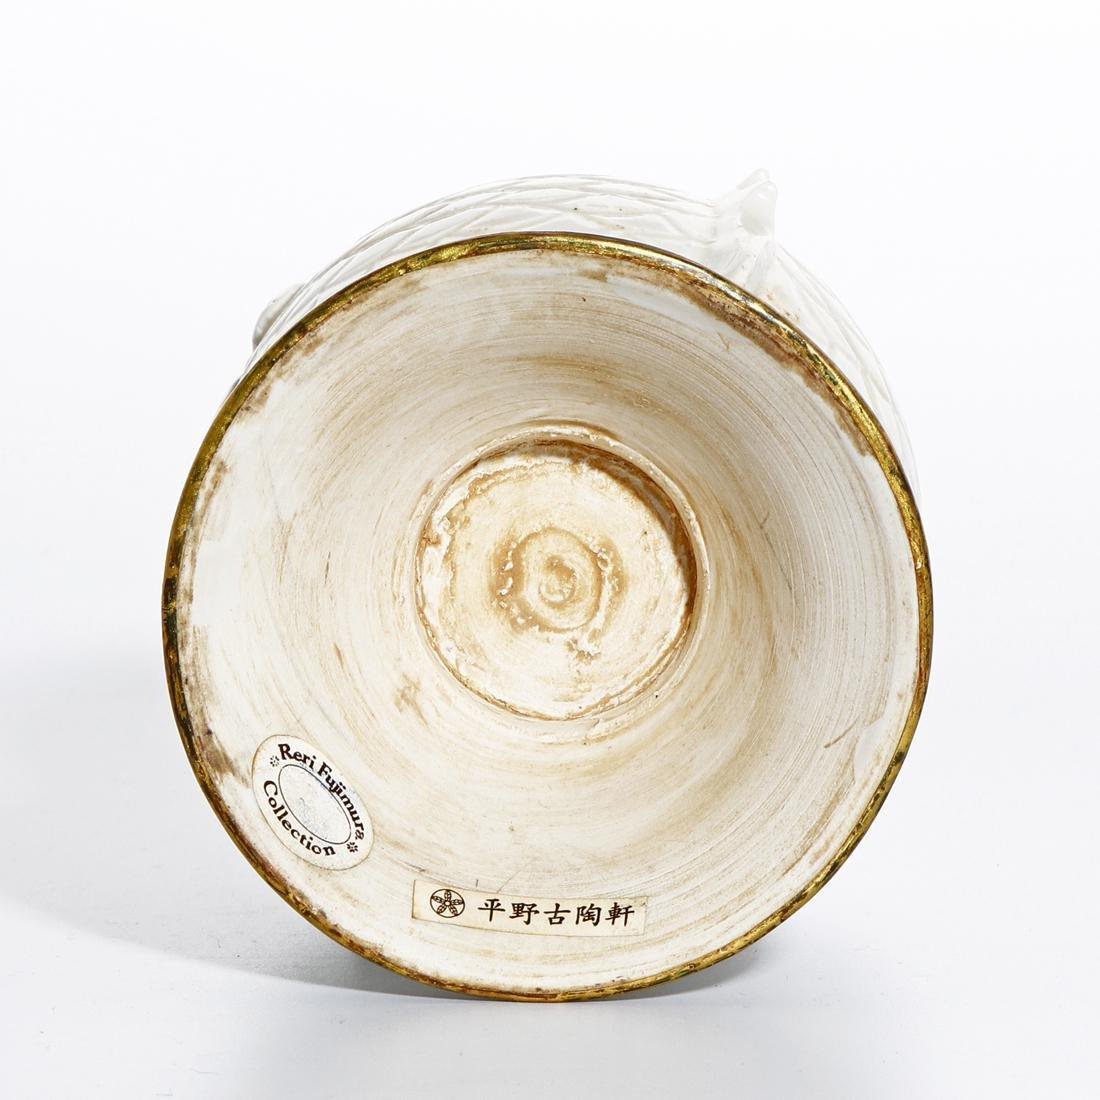 RareChinese Ding Ware Fish Form Bottle Vase - 7